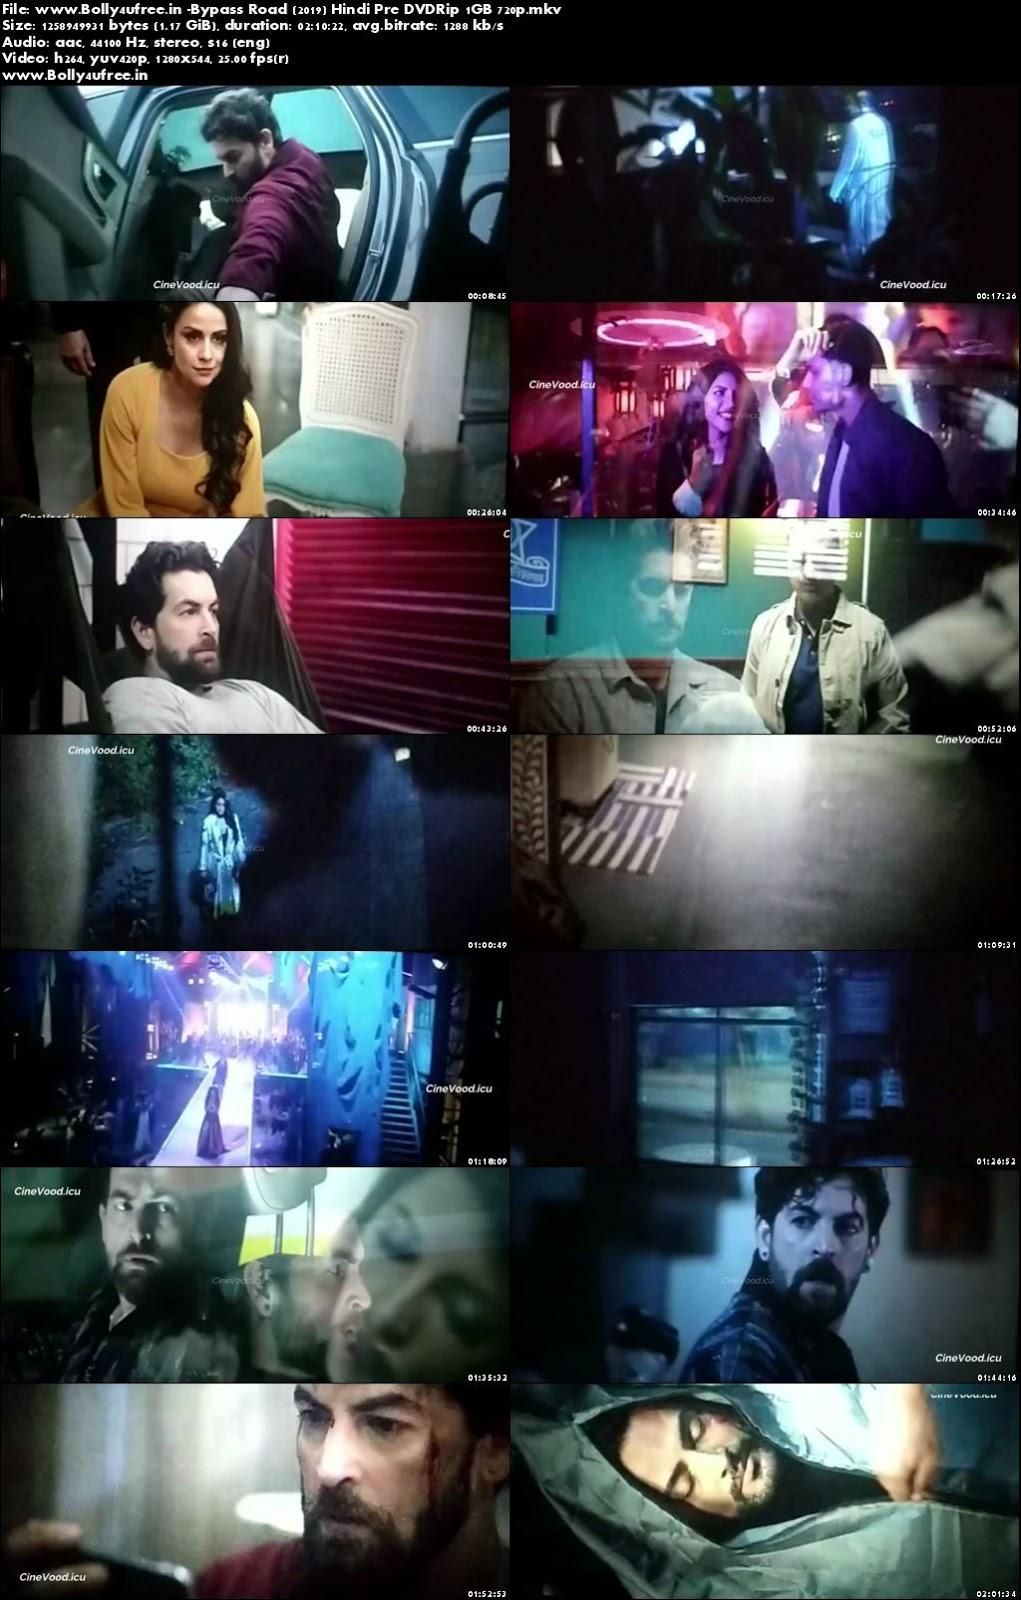 Bypass Road (2019) Hindi Pre DVDRip 480p 400MB